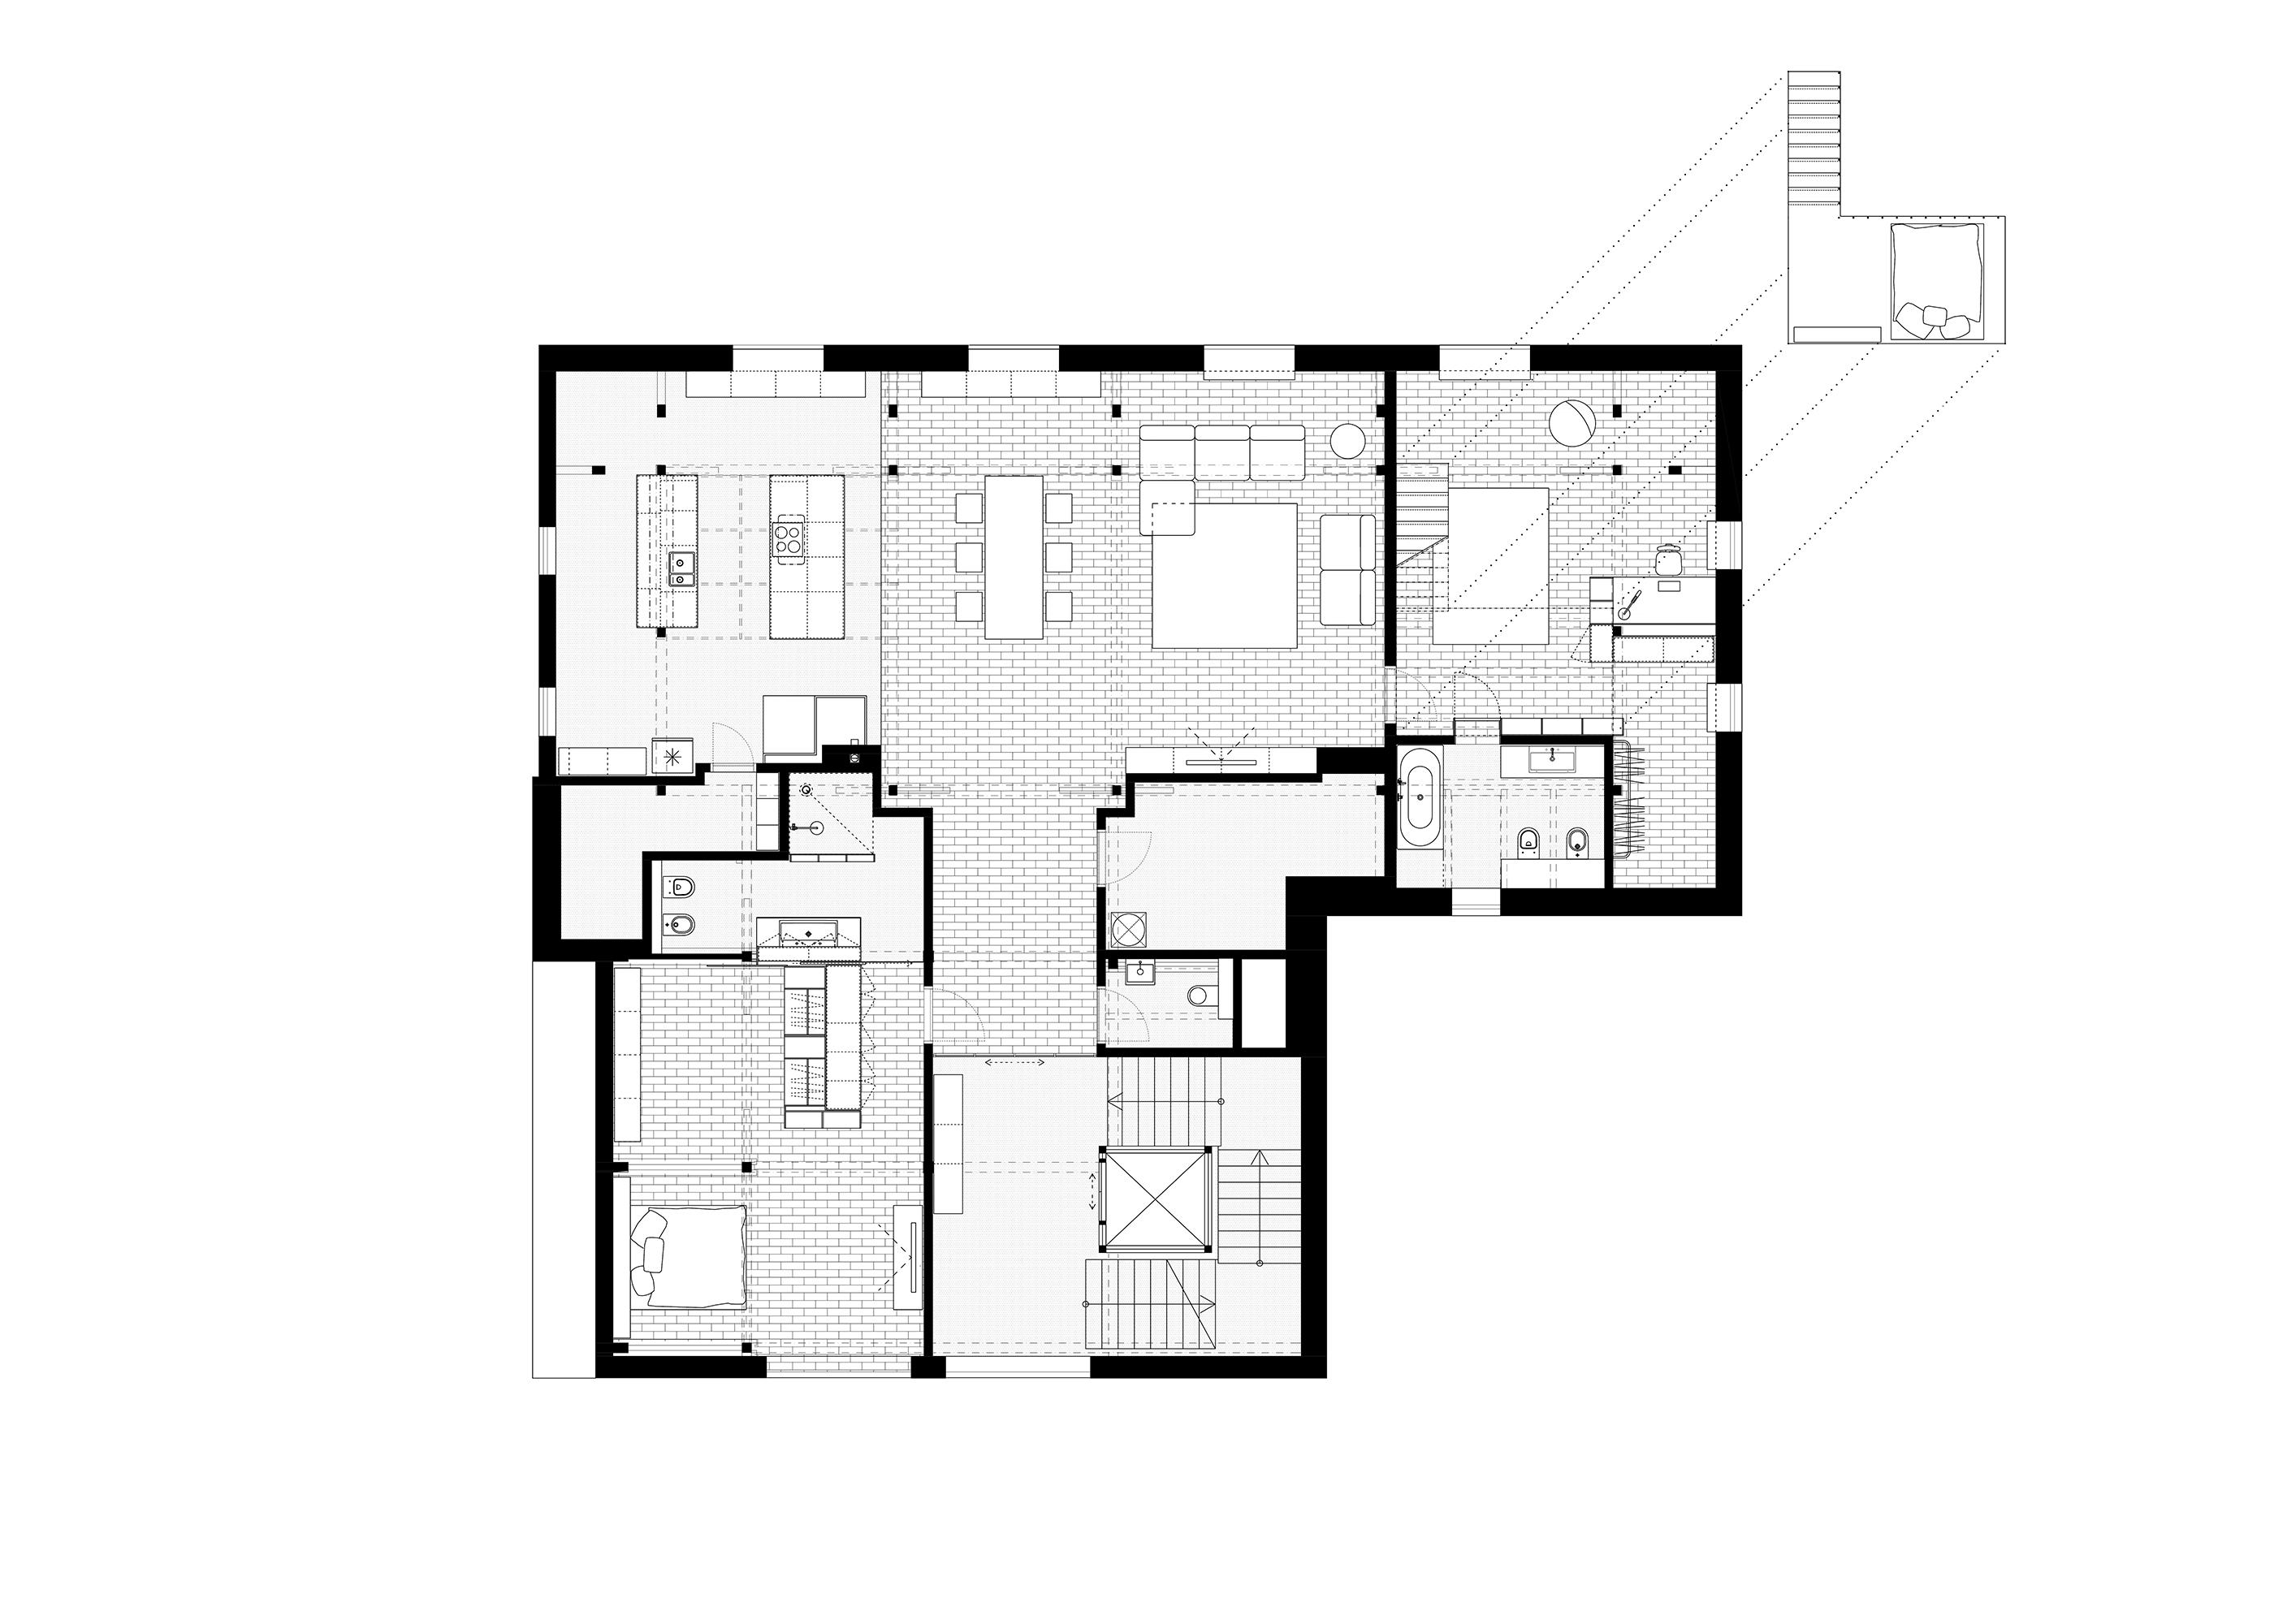 noiz-architekti-bratislava-dom-prilepy-02